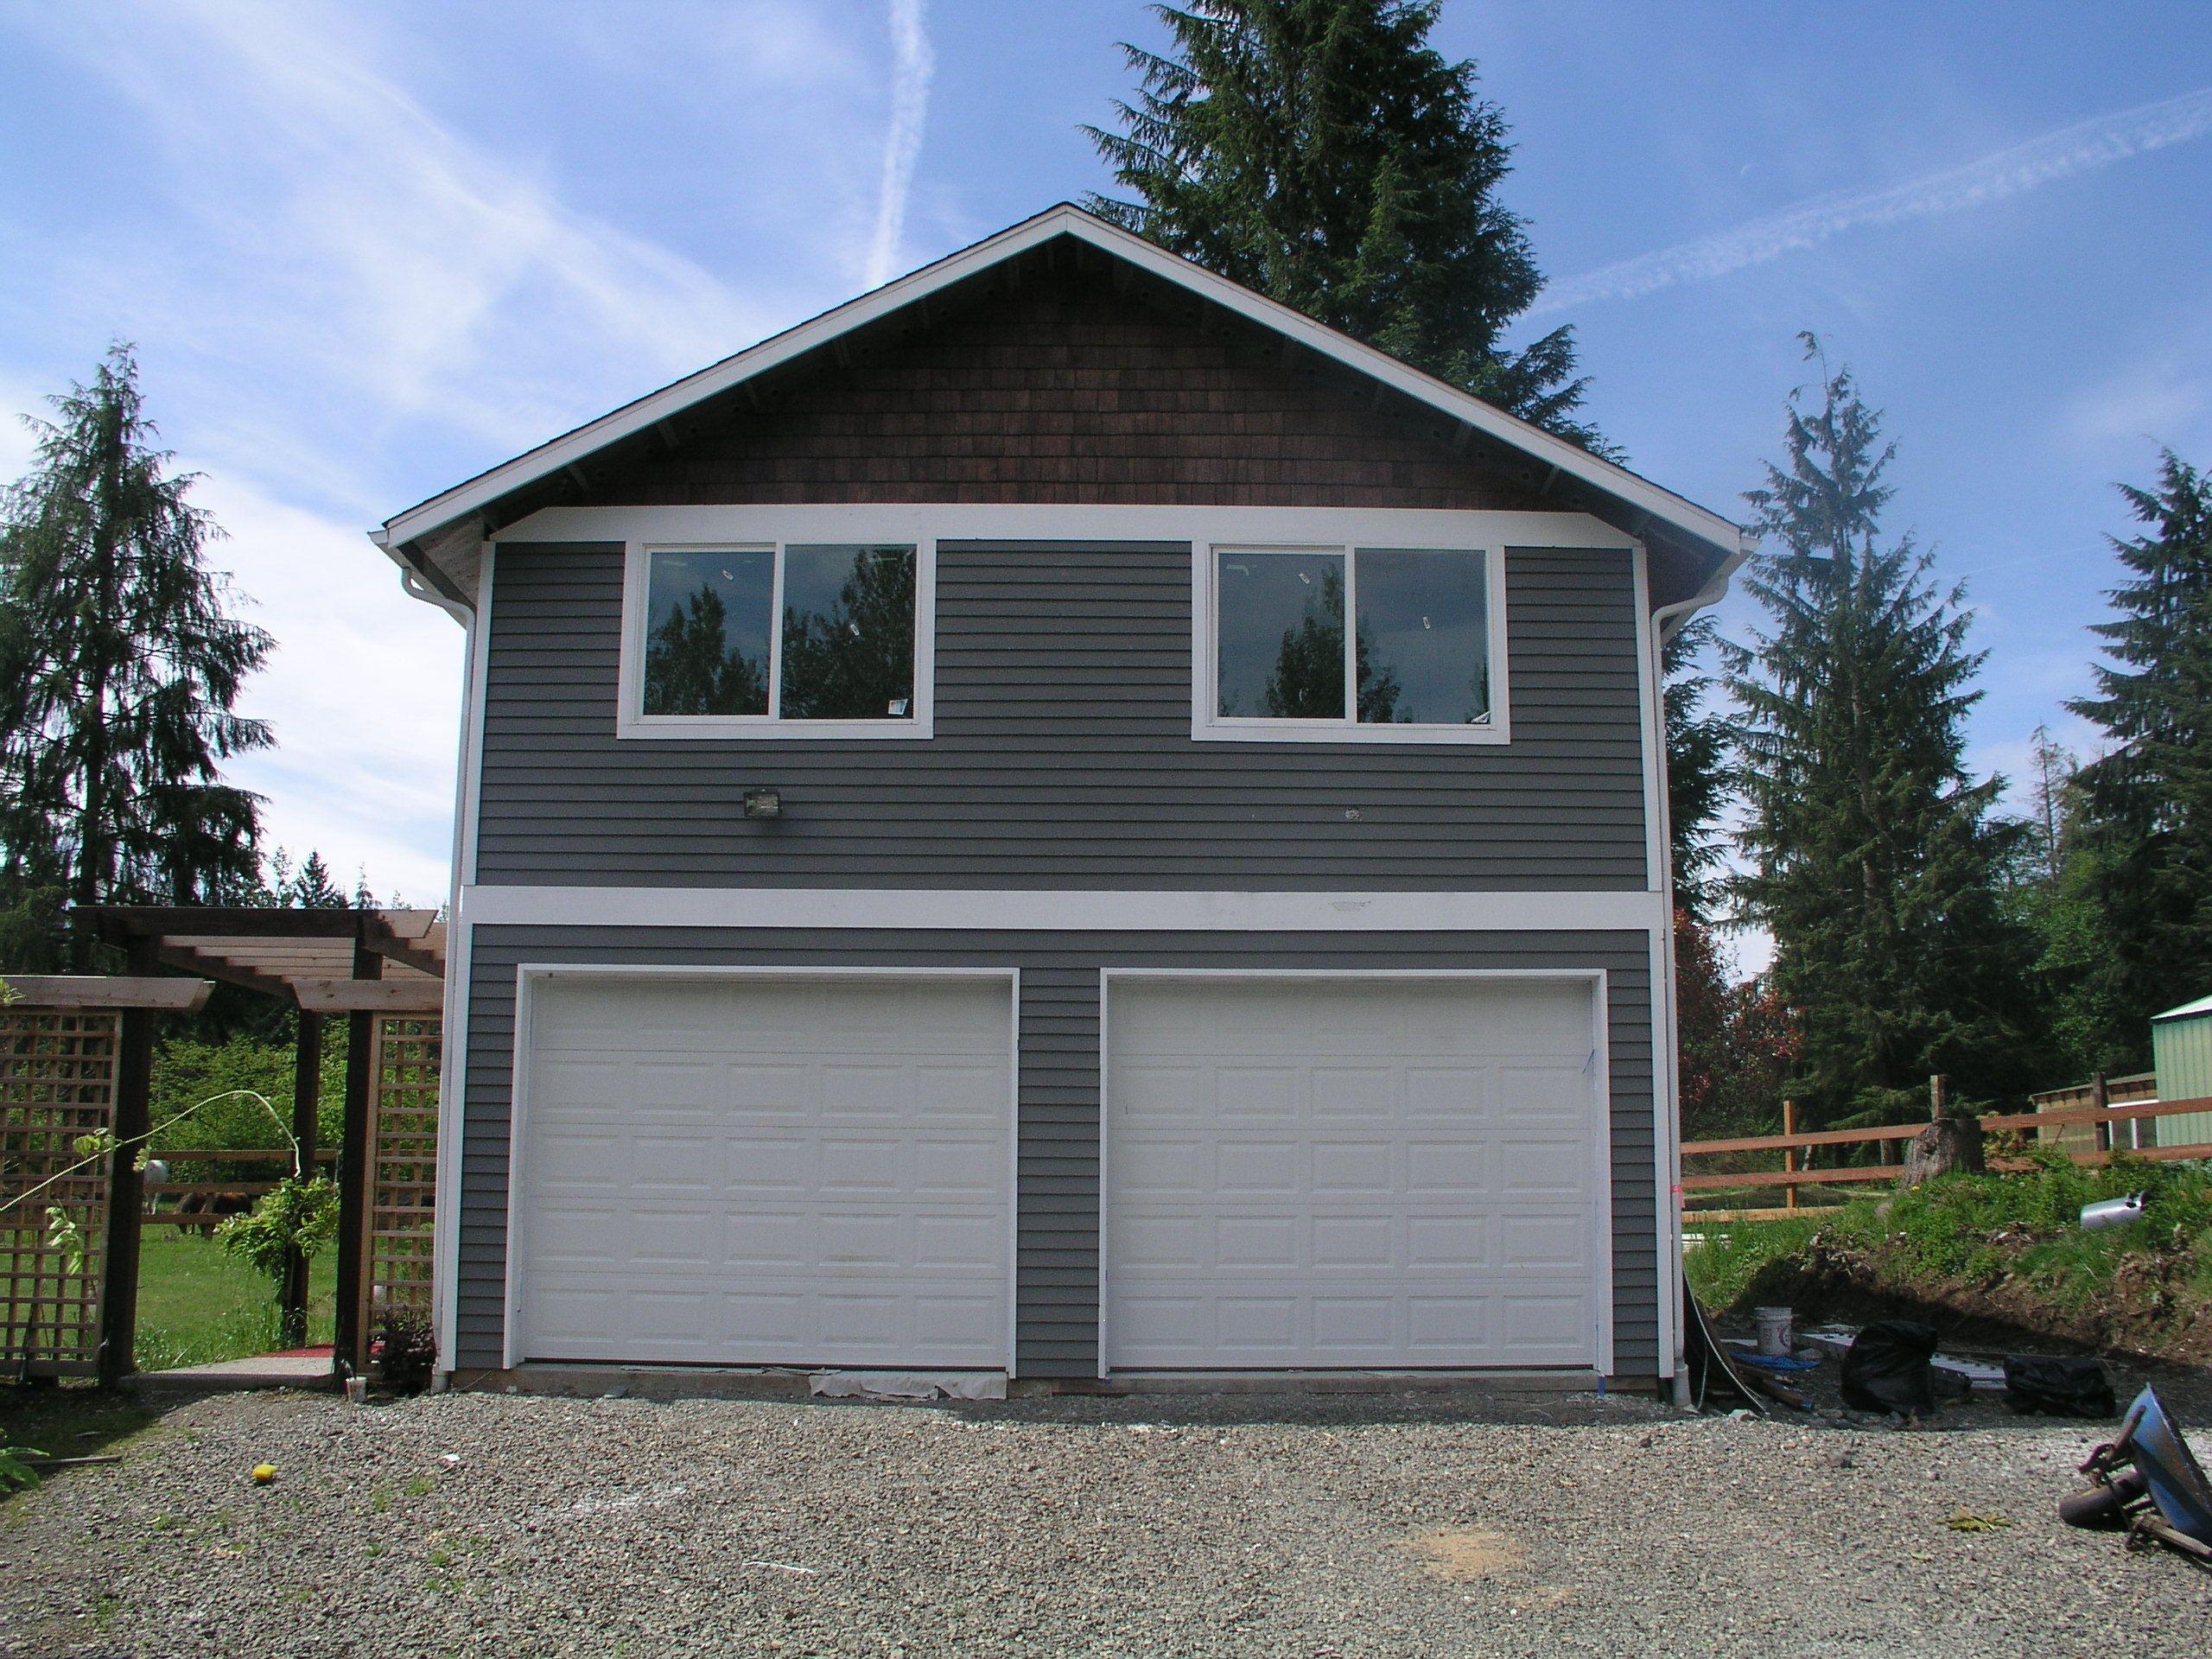 Stunning Build A Garage Apartment Photos - Liltigertoo.com ...